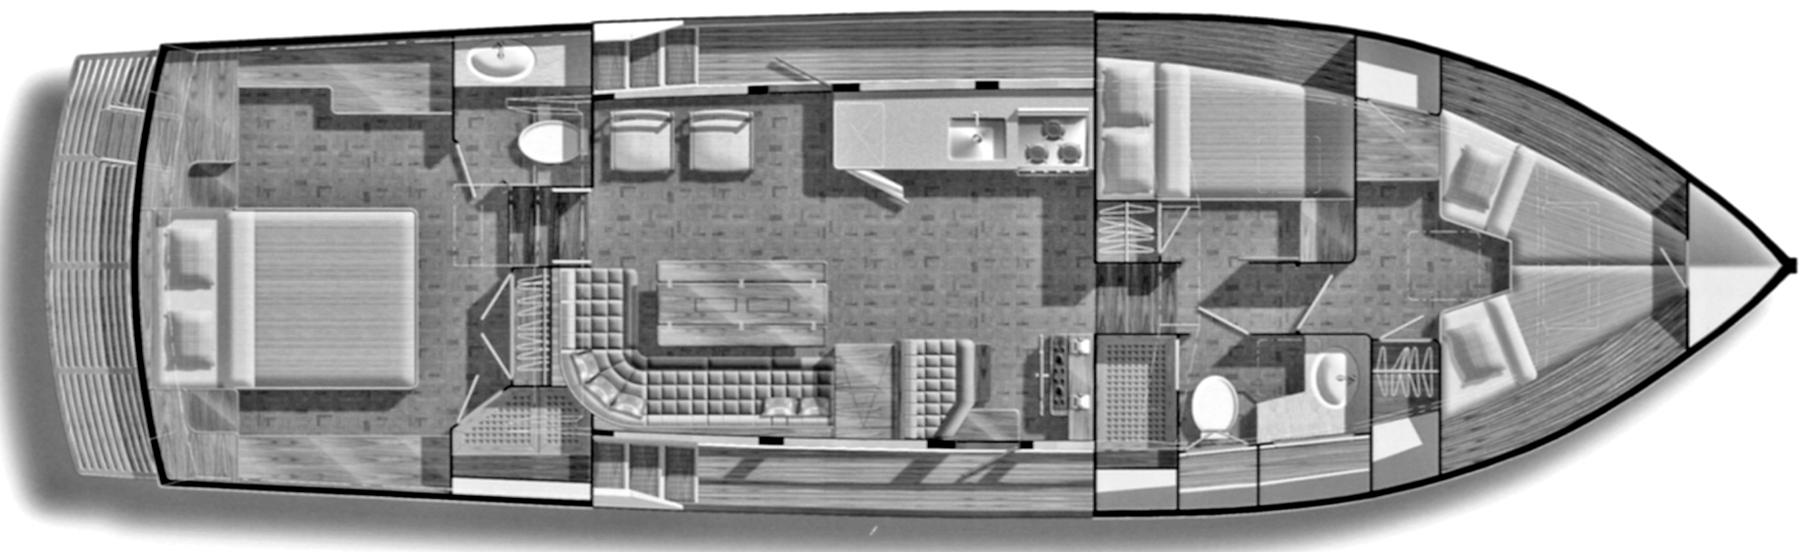 42 Motor Yacht Floor Plan 2